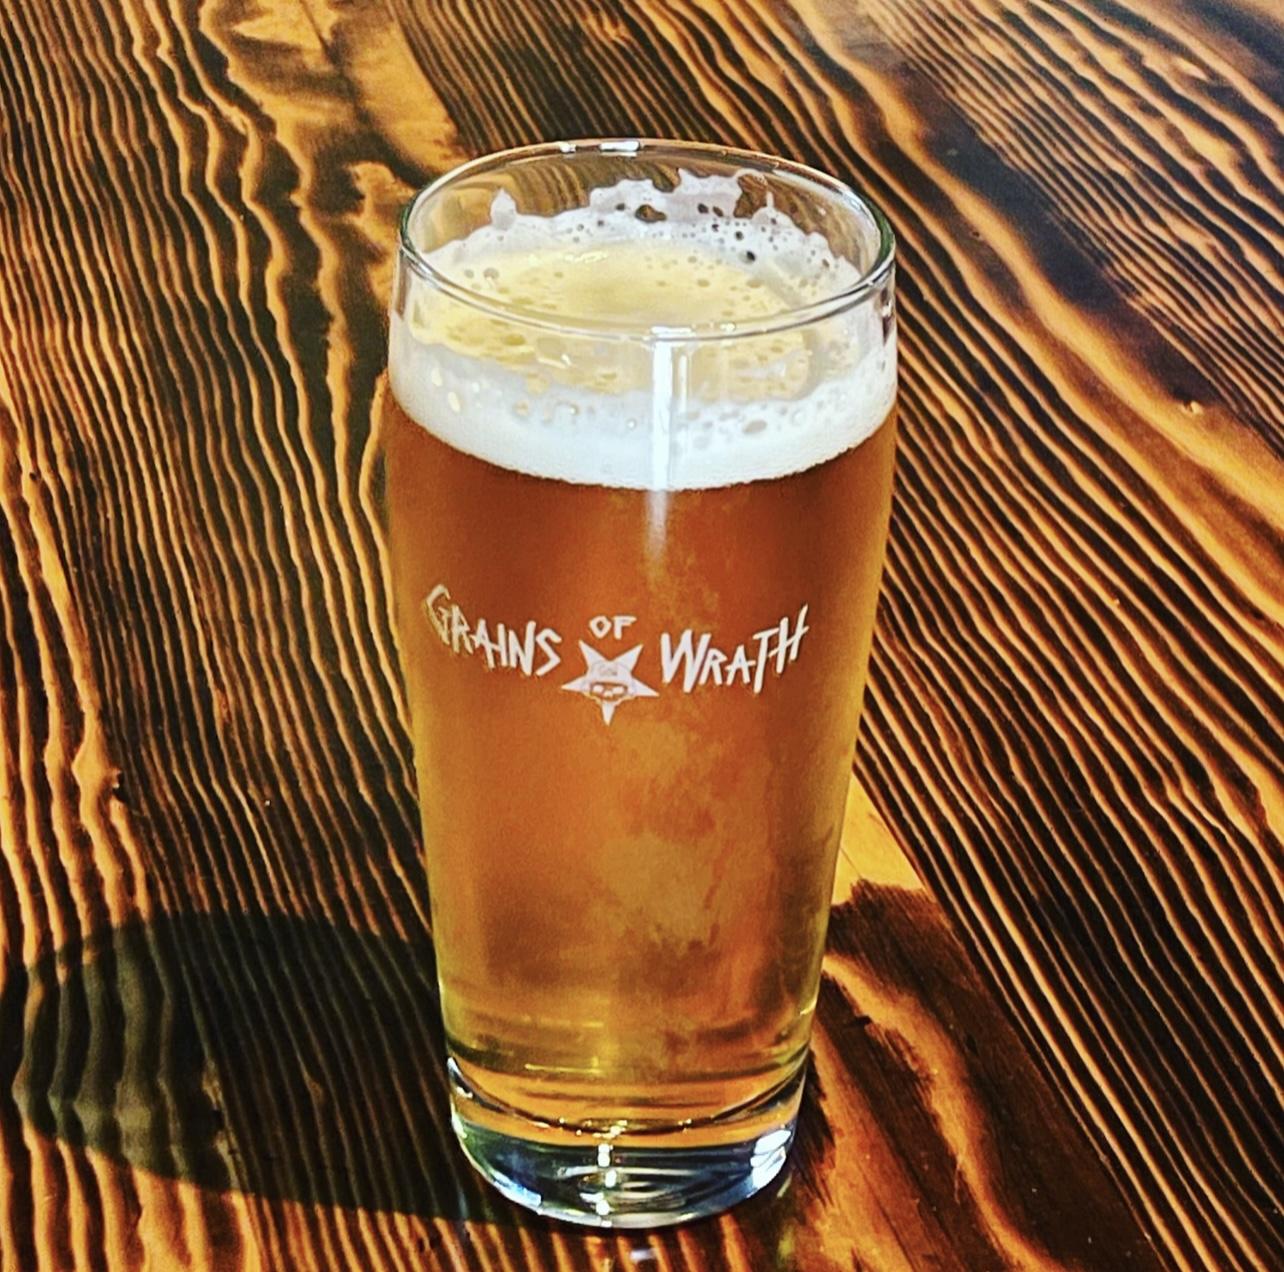 Michael Hunsaker Grains of Wrath Brewery - Craft Beer Podcast Episode 128 by Steven Shomler